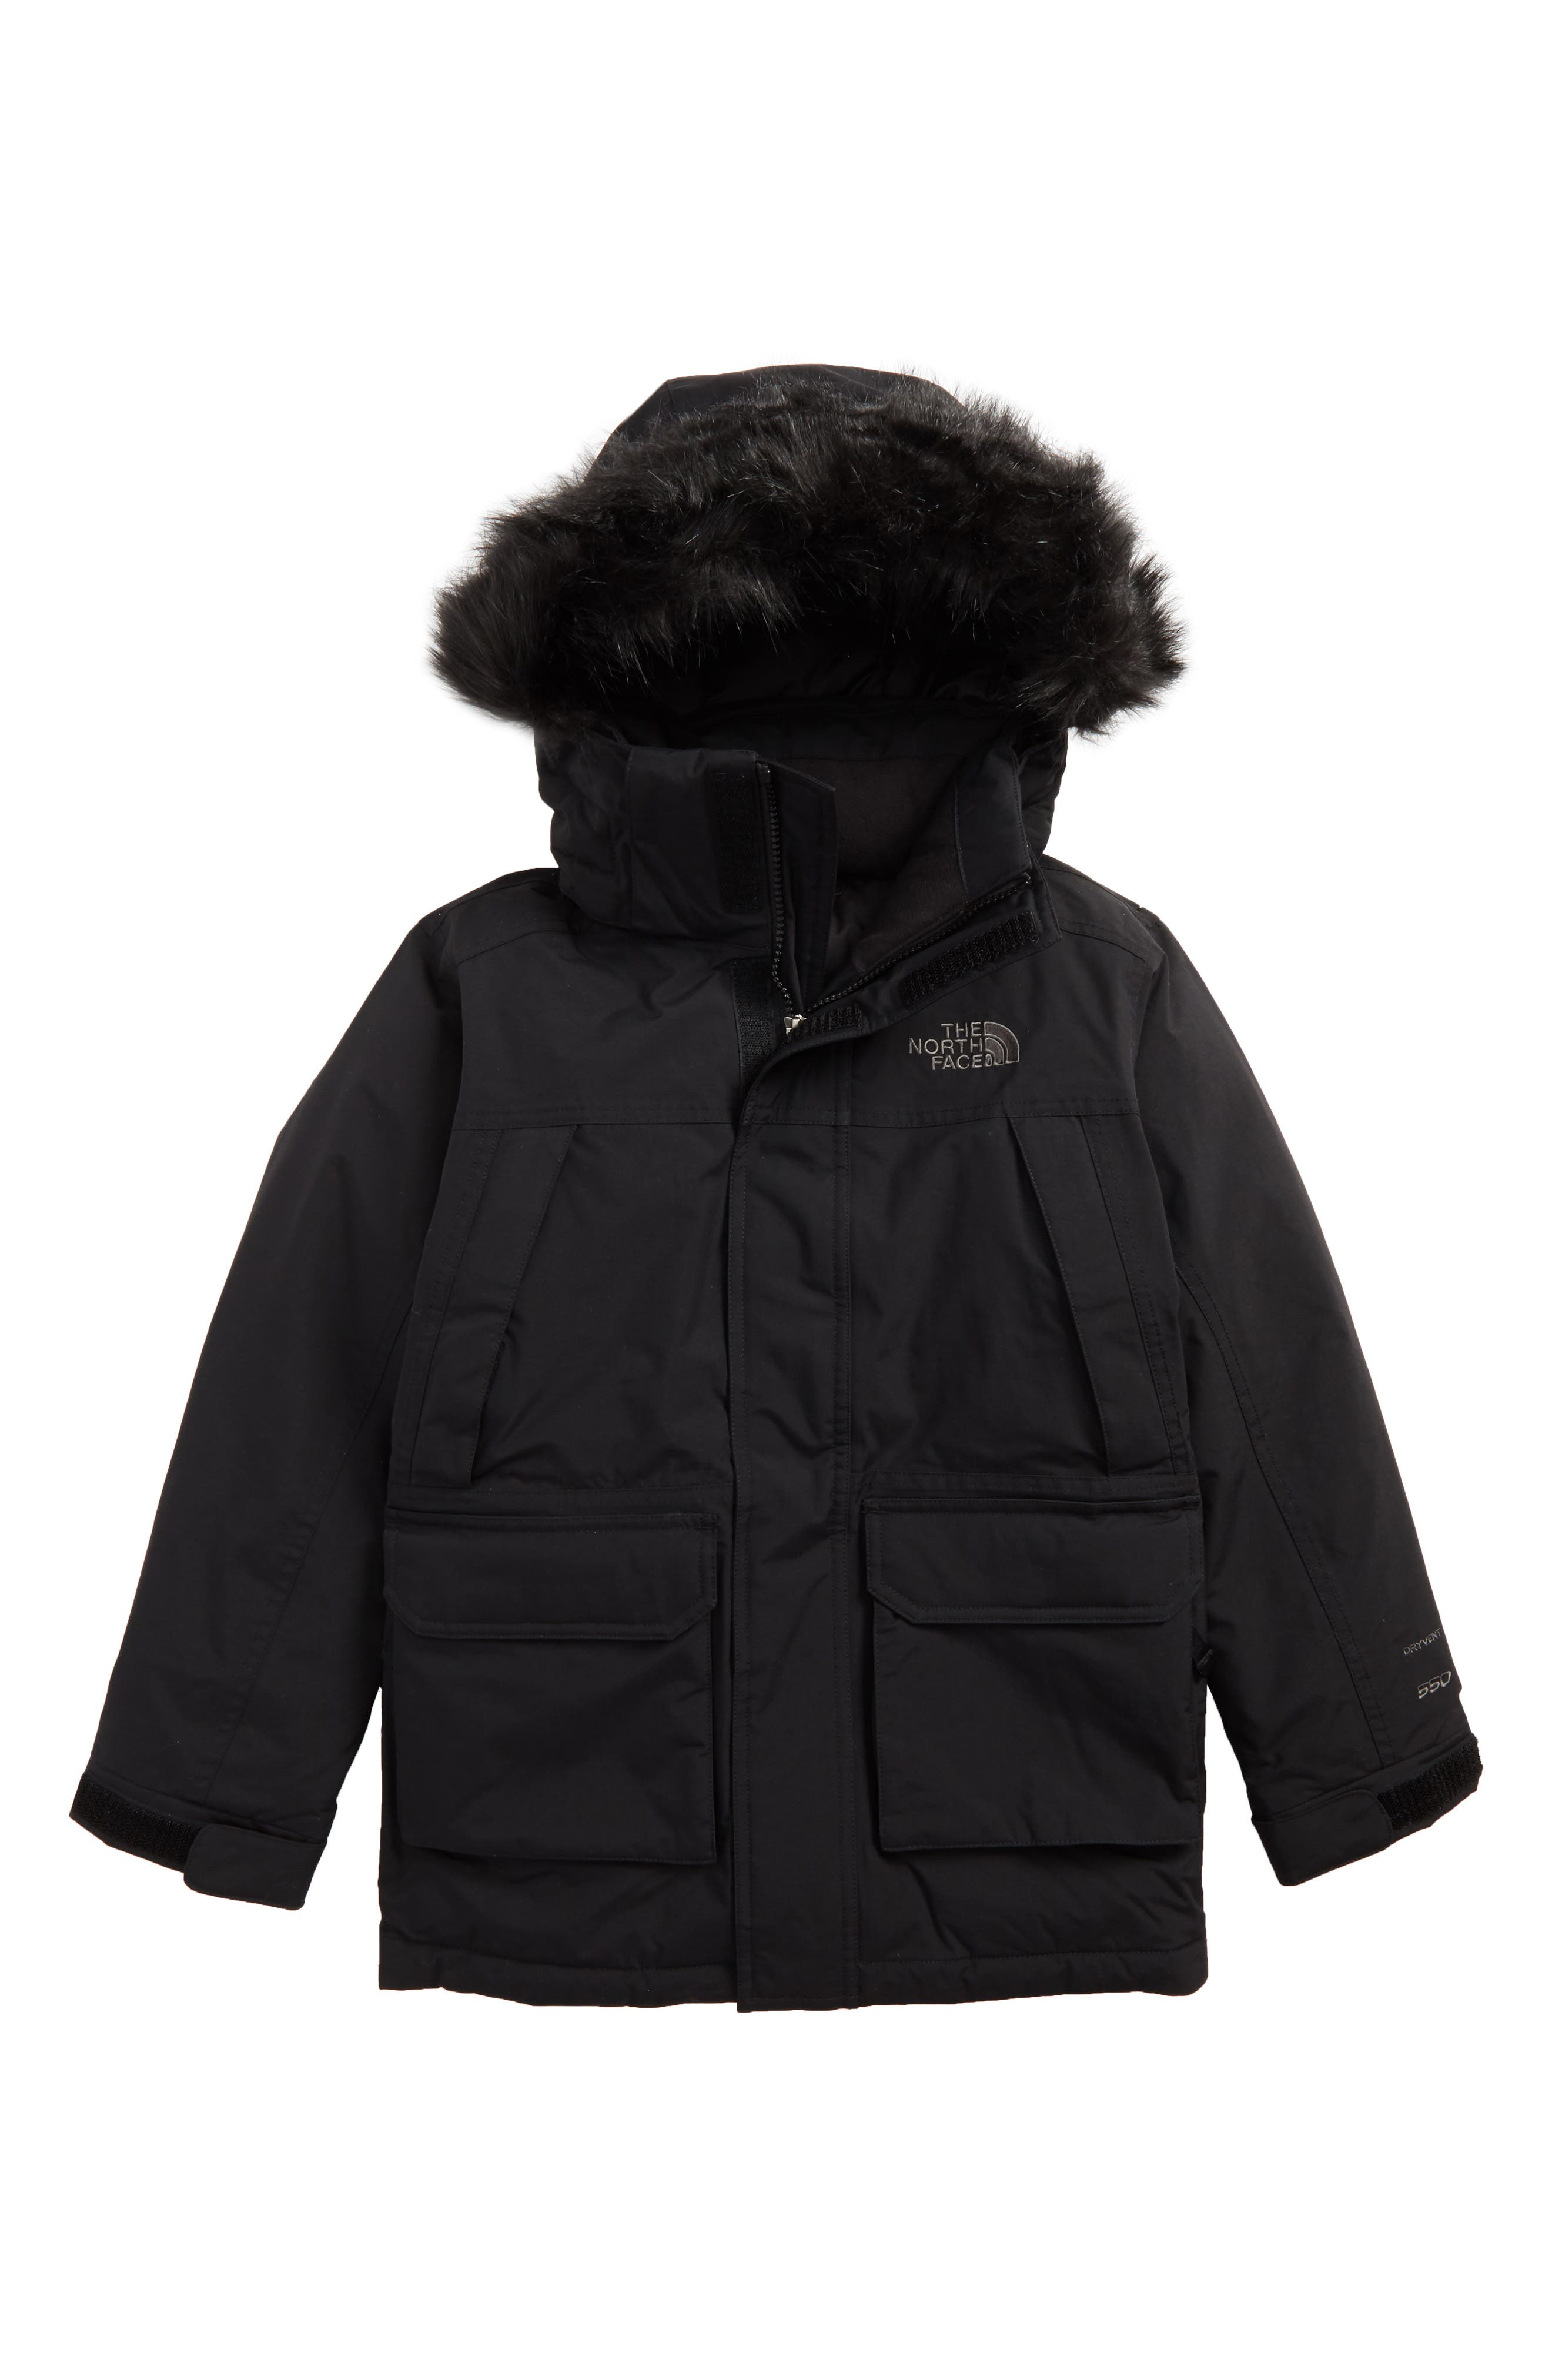 McMurdo Waterproof Down Parka with Faux Fur Trim,                         Main,                         color, 001